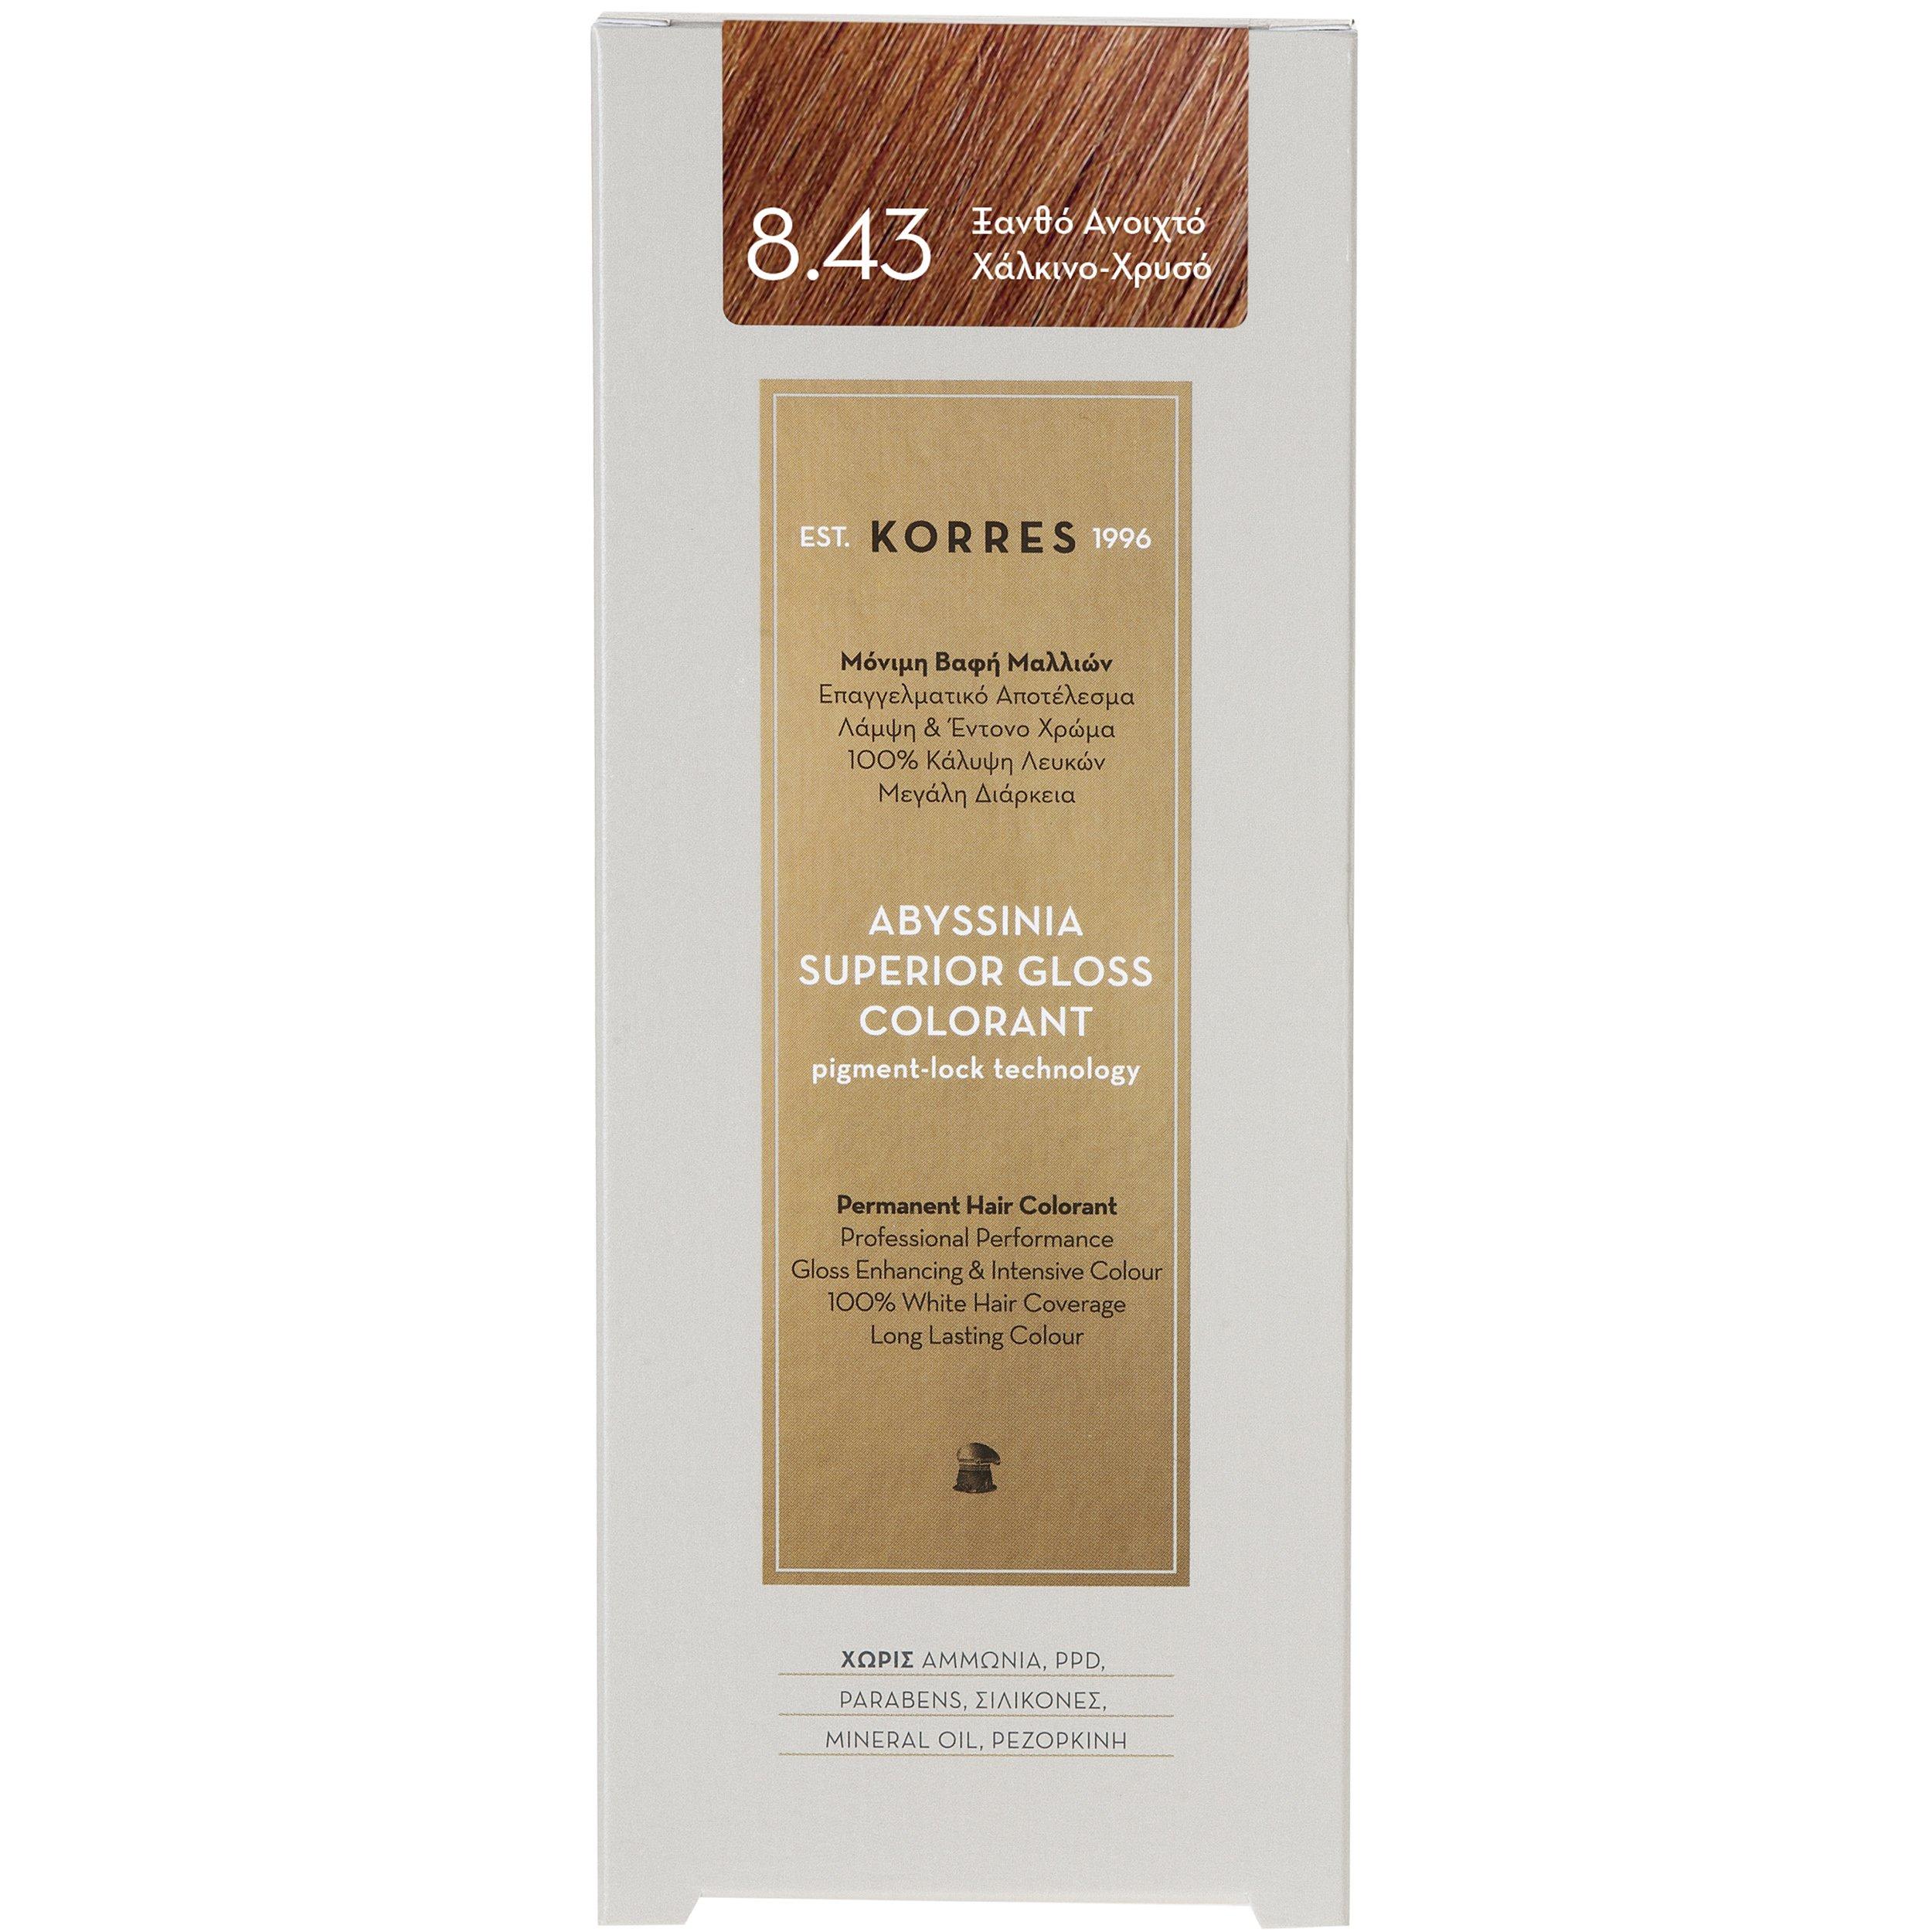 Korres Abyssinia Superior Gloss Colorant Επαγγελματικό Αποτέλεσμα Λάμψη & Έντονο Χρώμα – 8.43 ΞΑΝΘΟ ΑΝΟΙΧΤΟ ΧΑΛΚΙΝΟ-ΧΡΥΣΟ